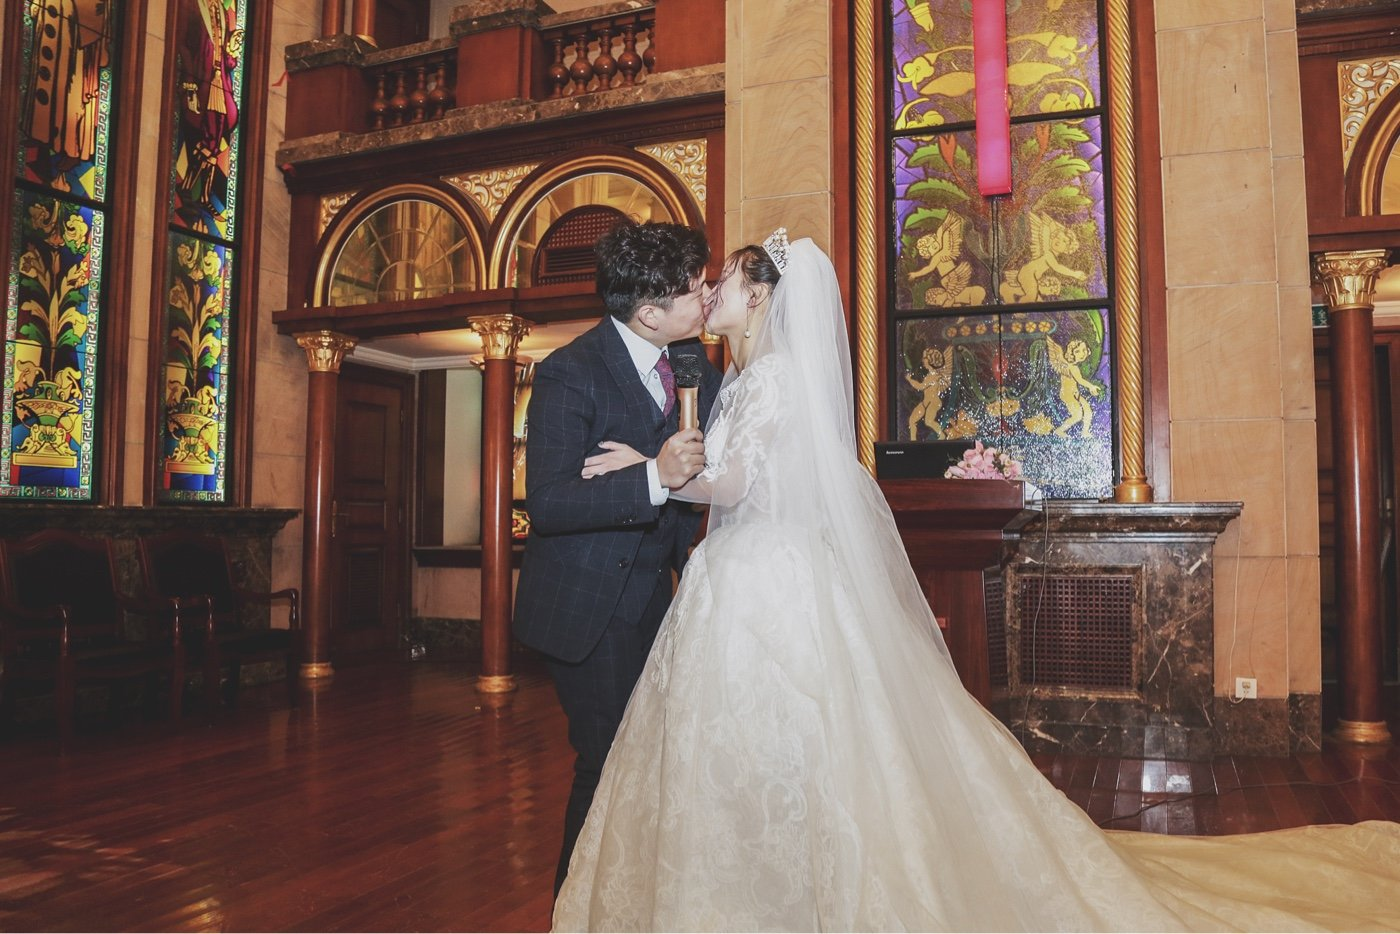 「Fantasy Wedding」&明珠教堂⛪0